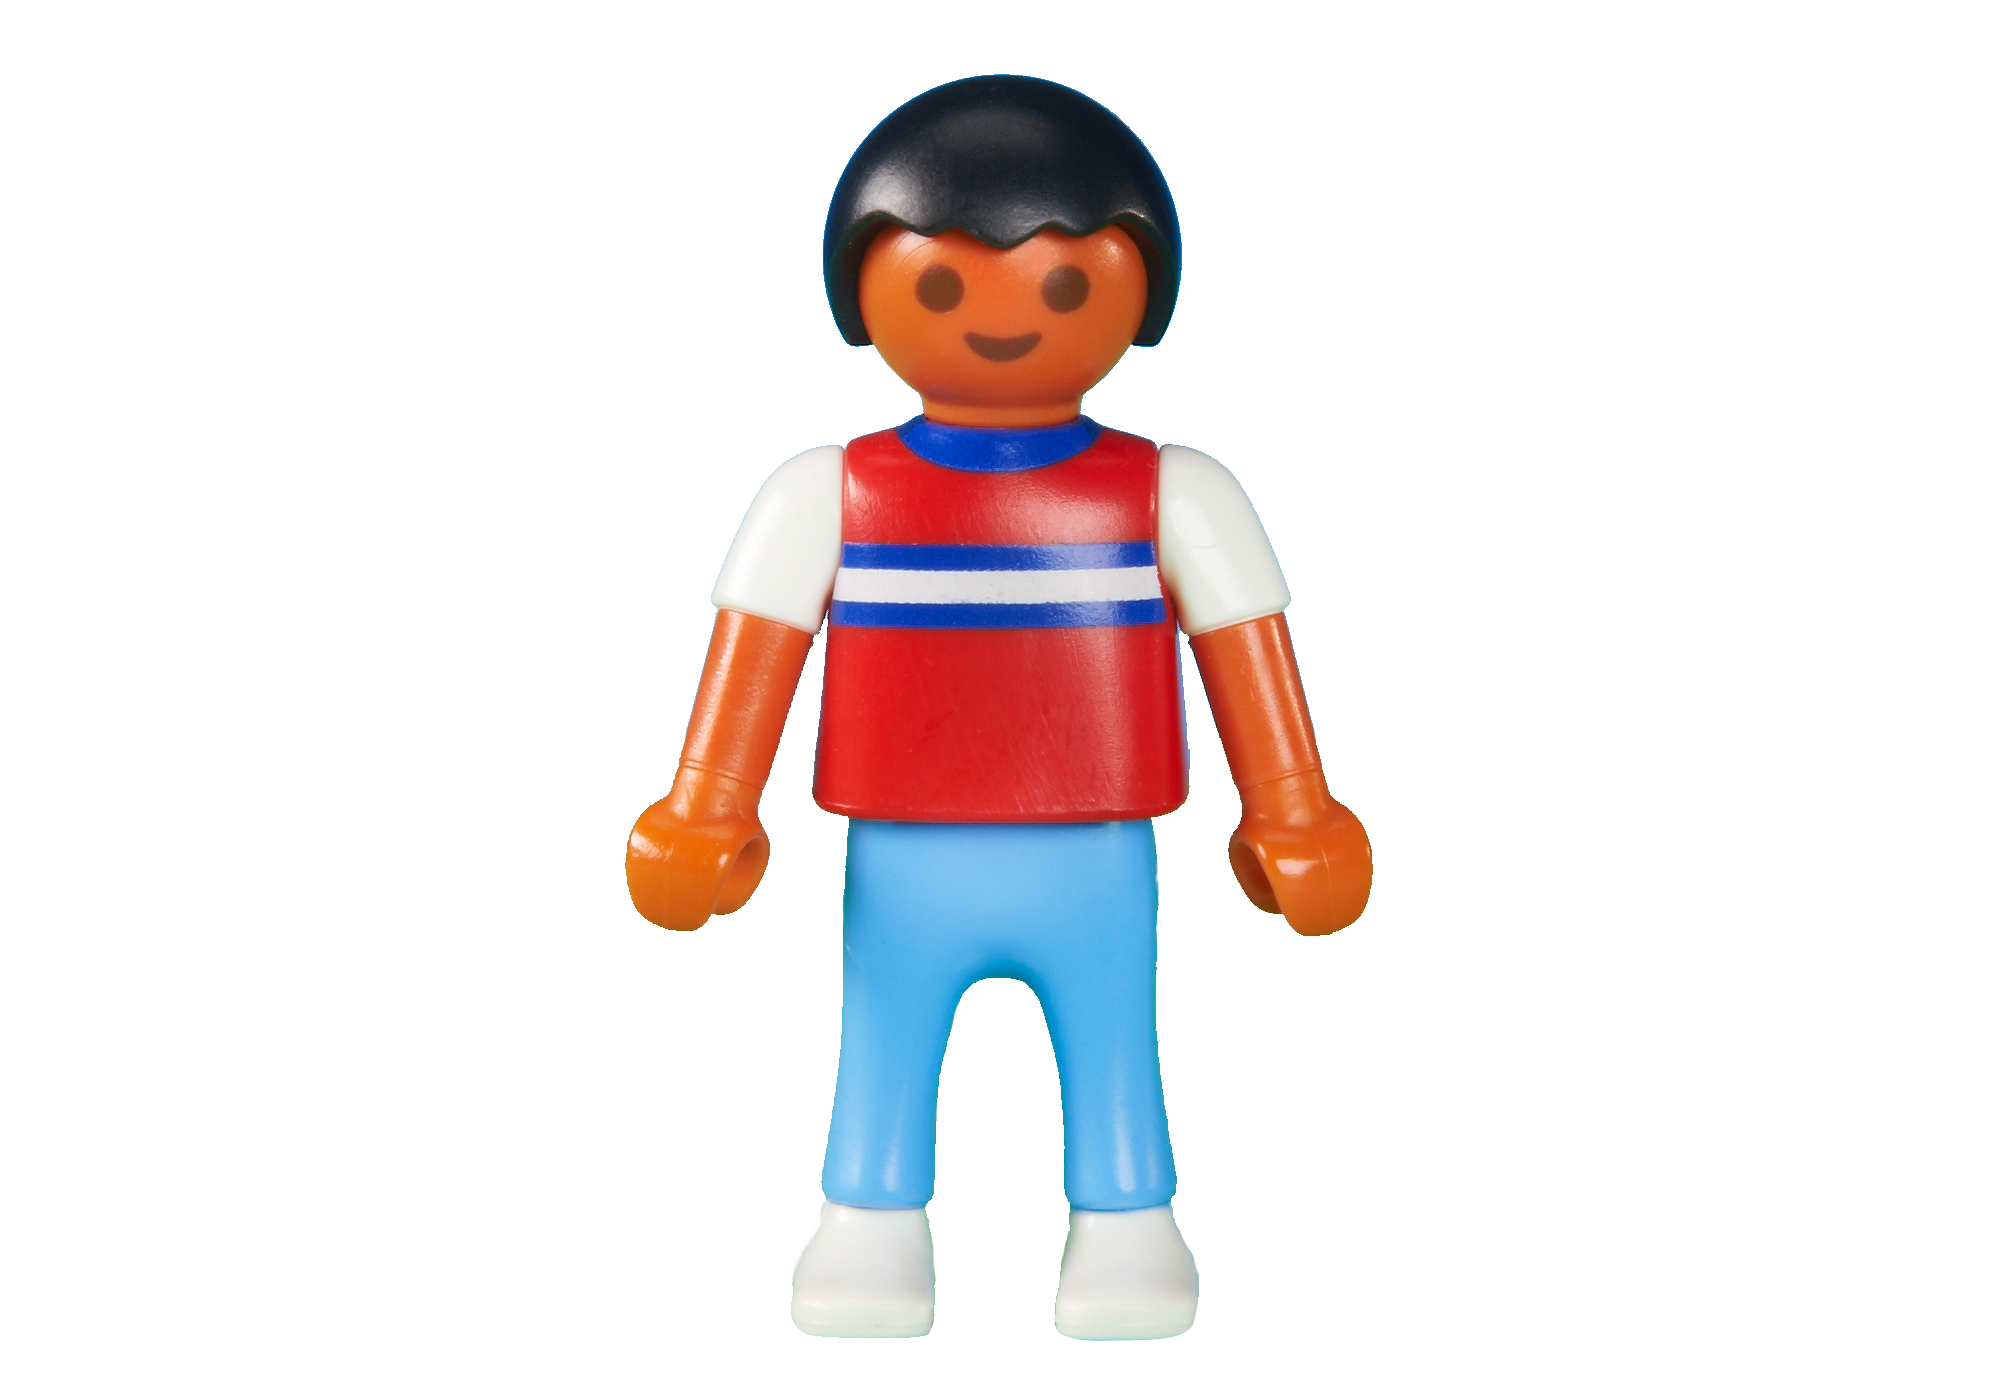 http://media.playmobil.com/i/playmobil/30101970_product_detail/Grundfigur Junge